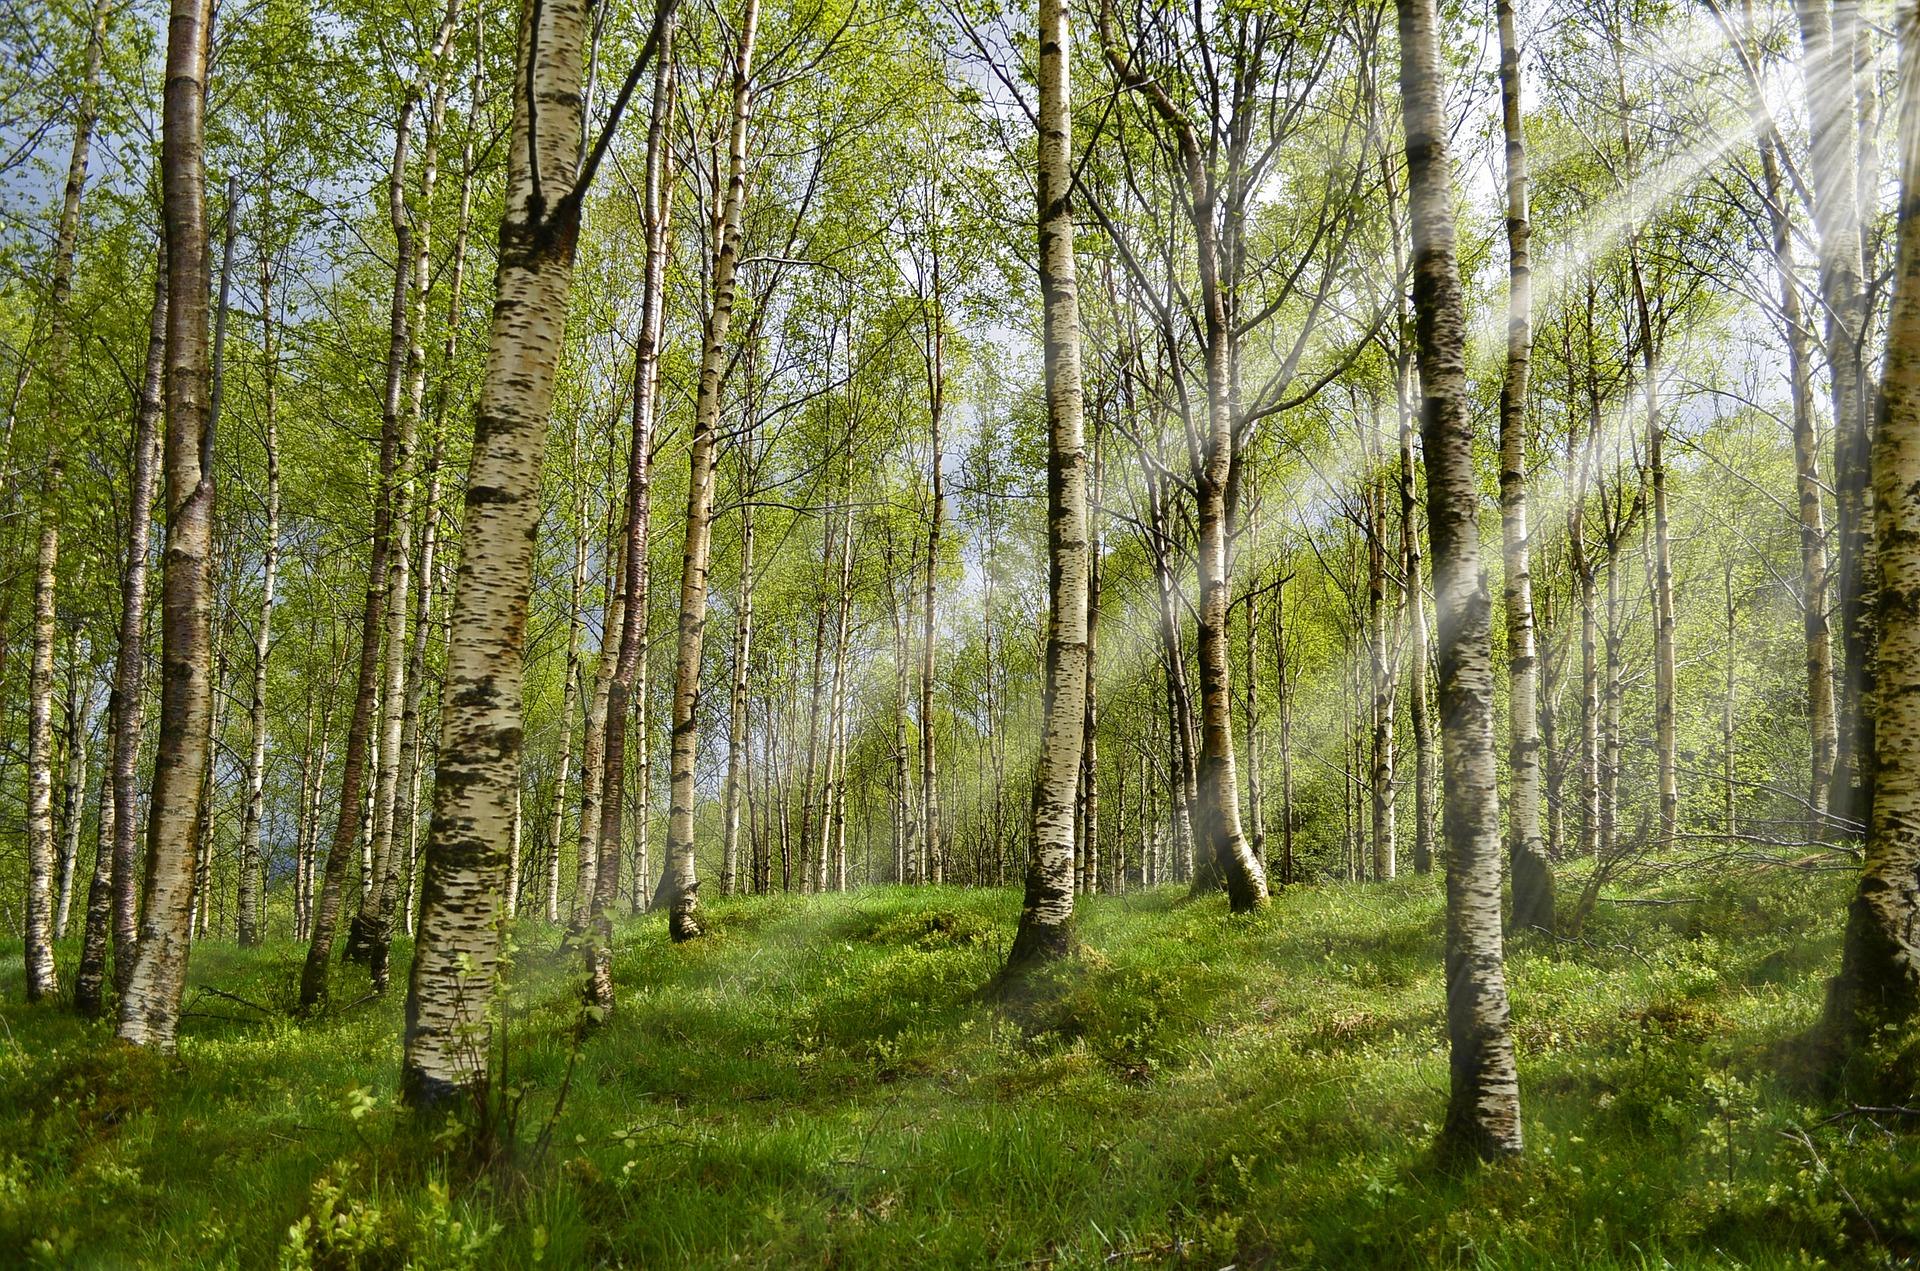 forest-2165356_1920_1493645468928.jpg